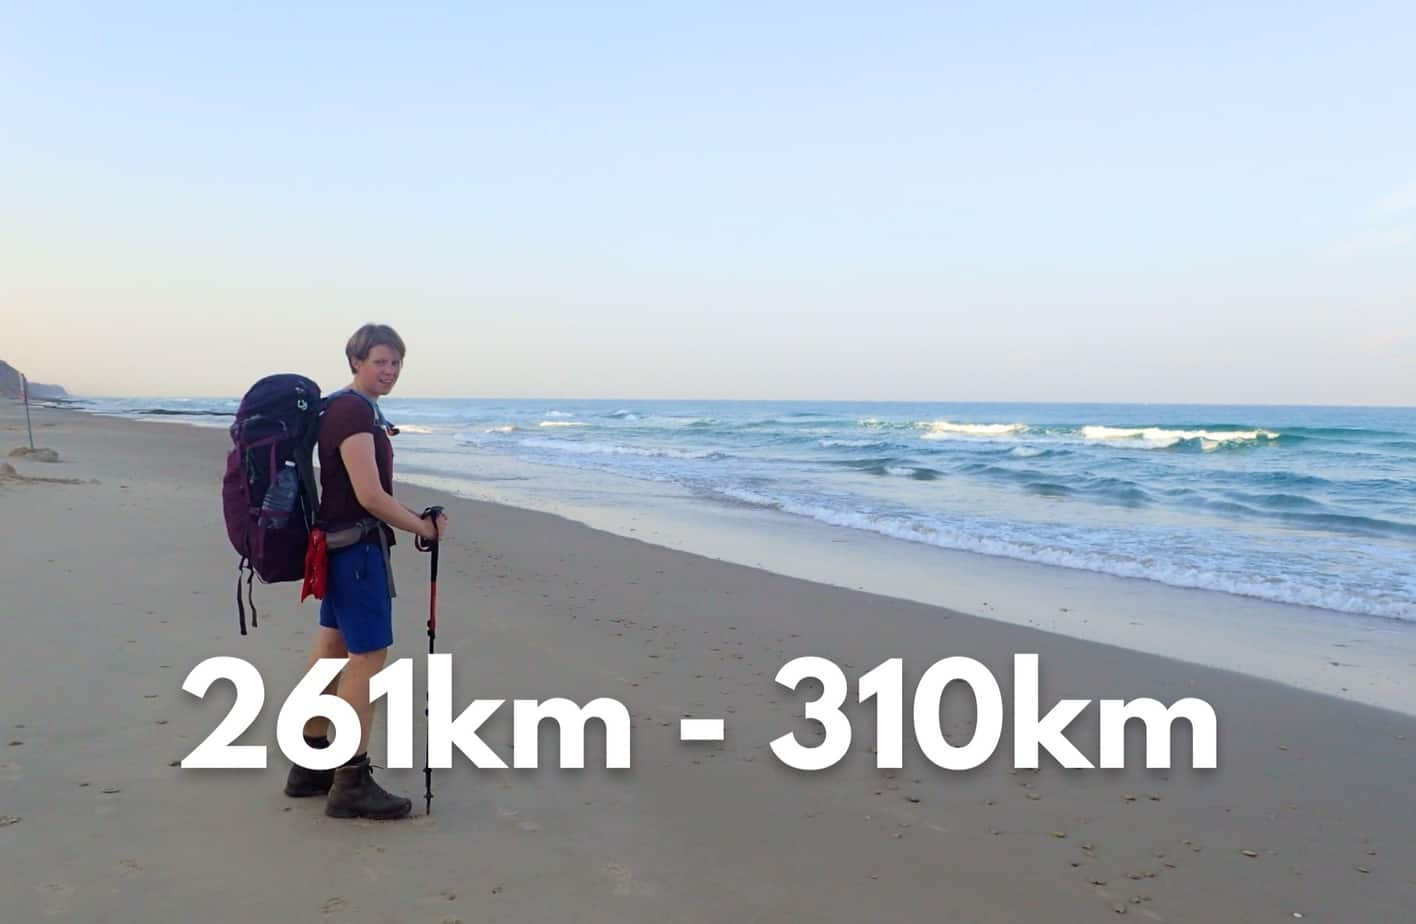 261-310km